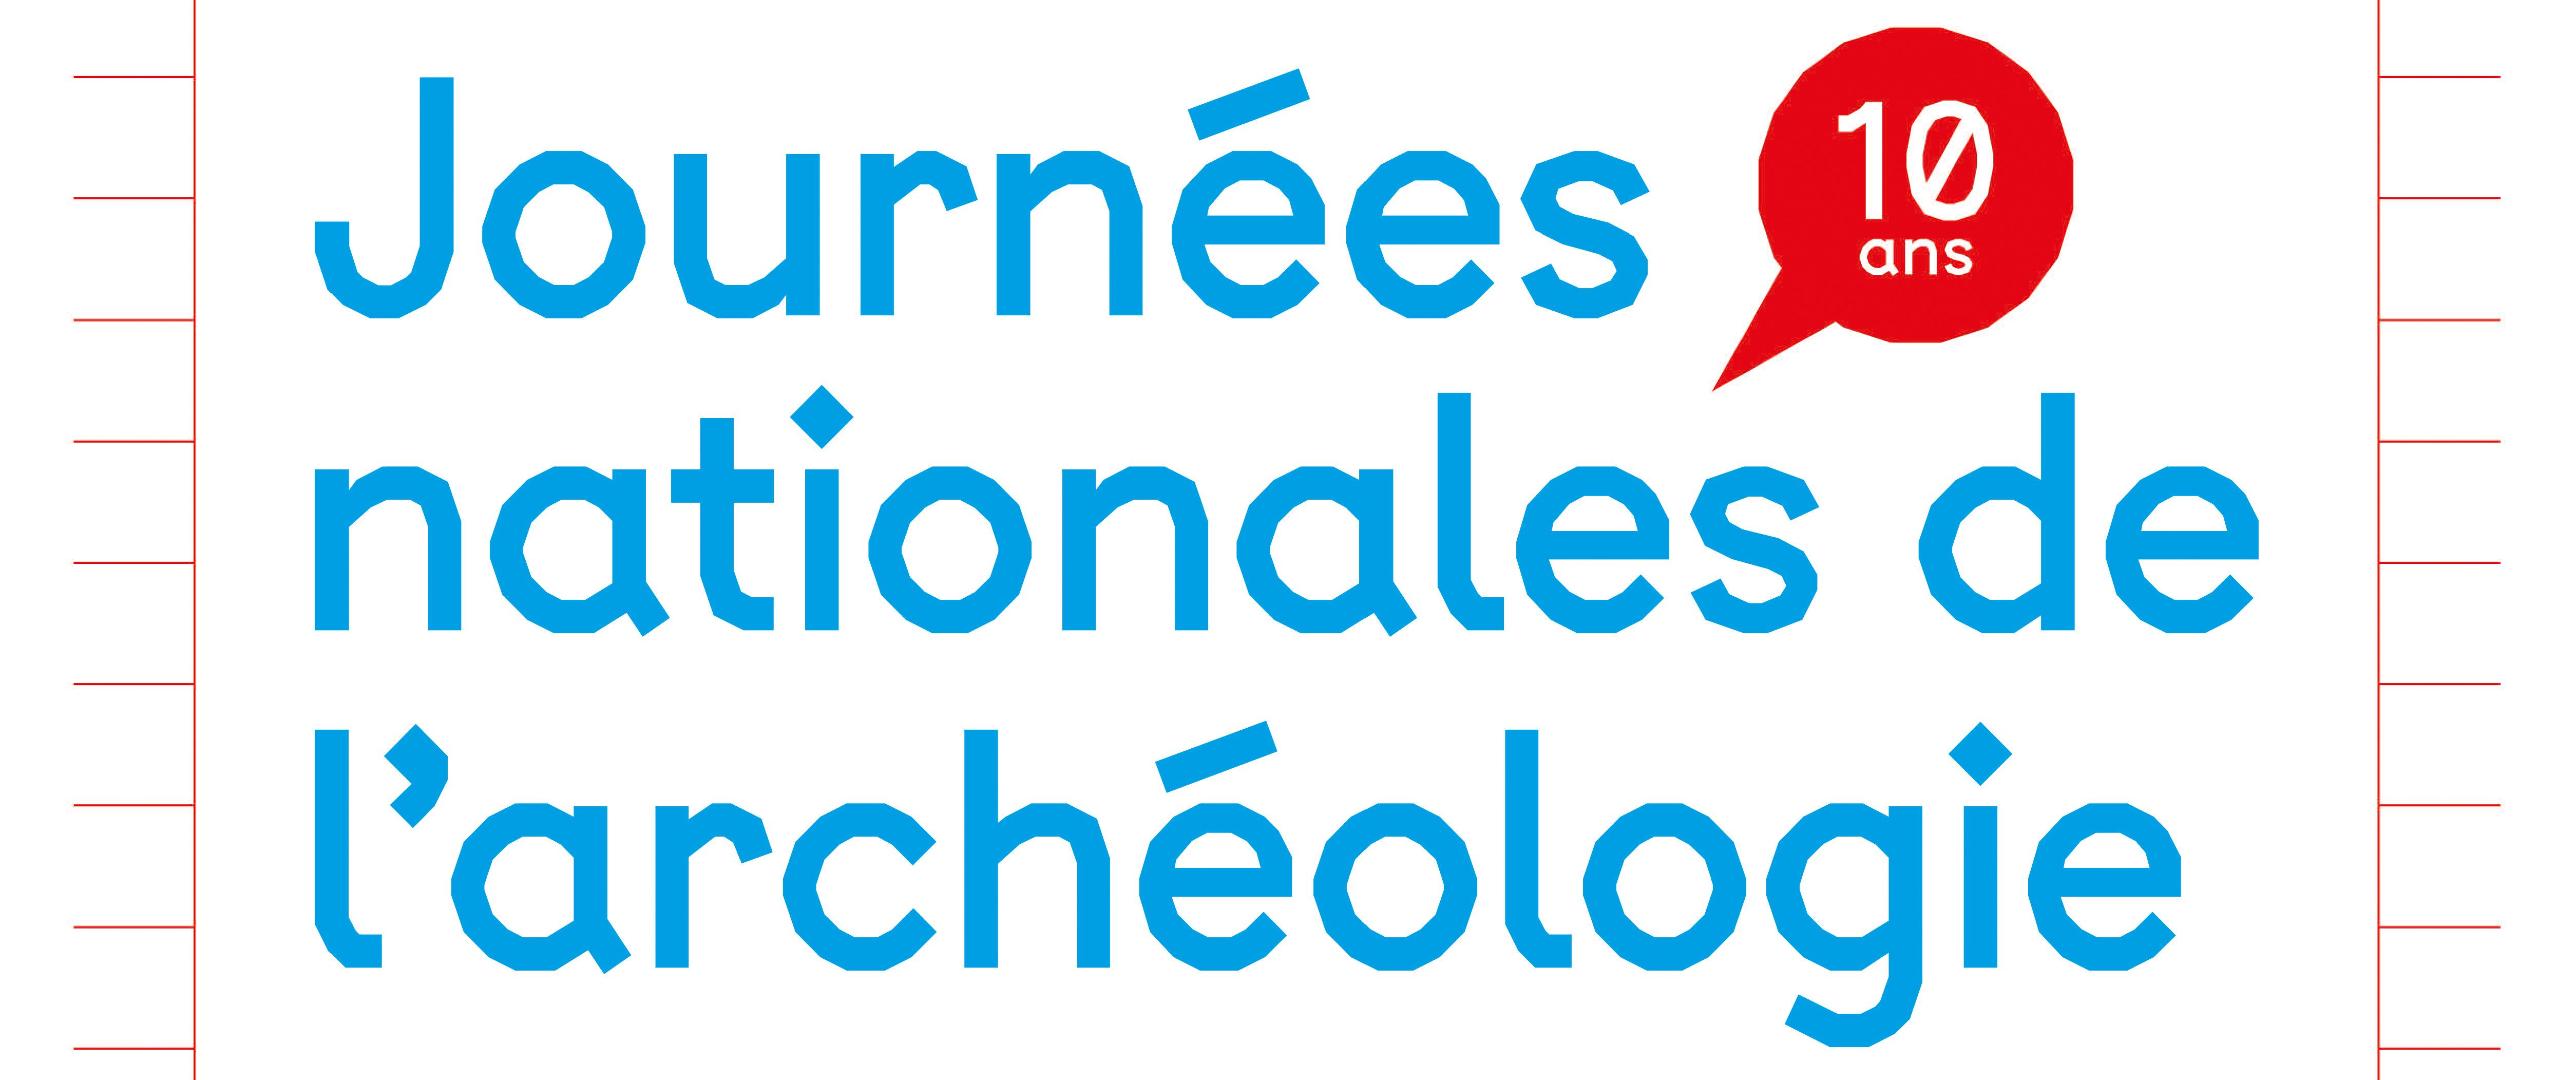 JOURNEES NATIONALES DE L'ARCHEOLOGIE